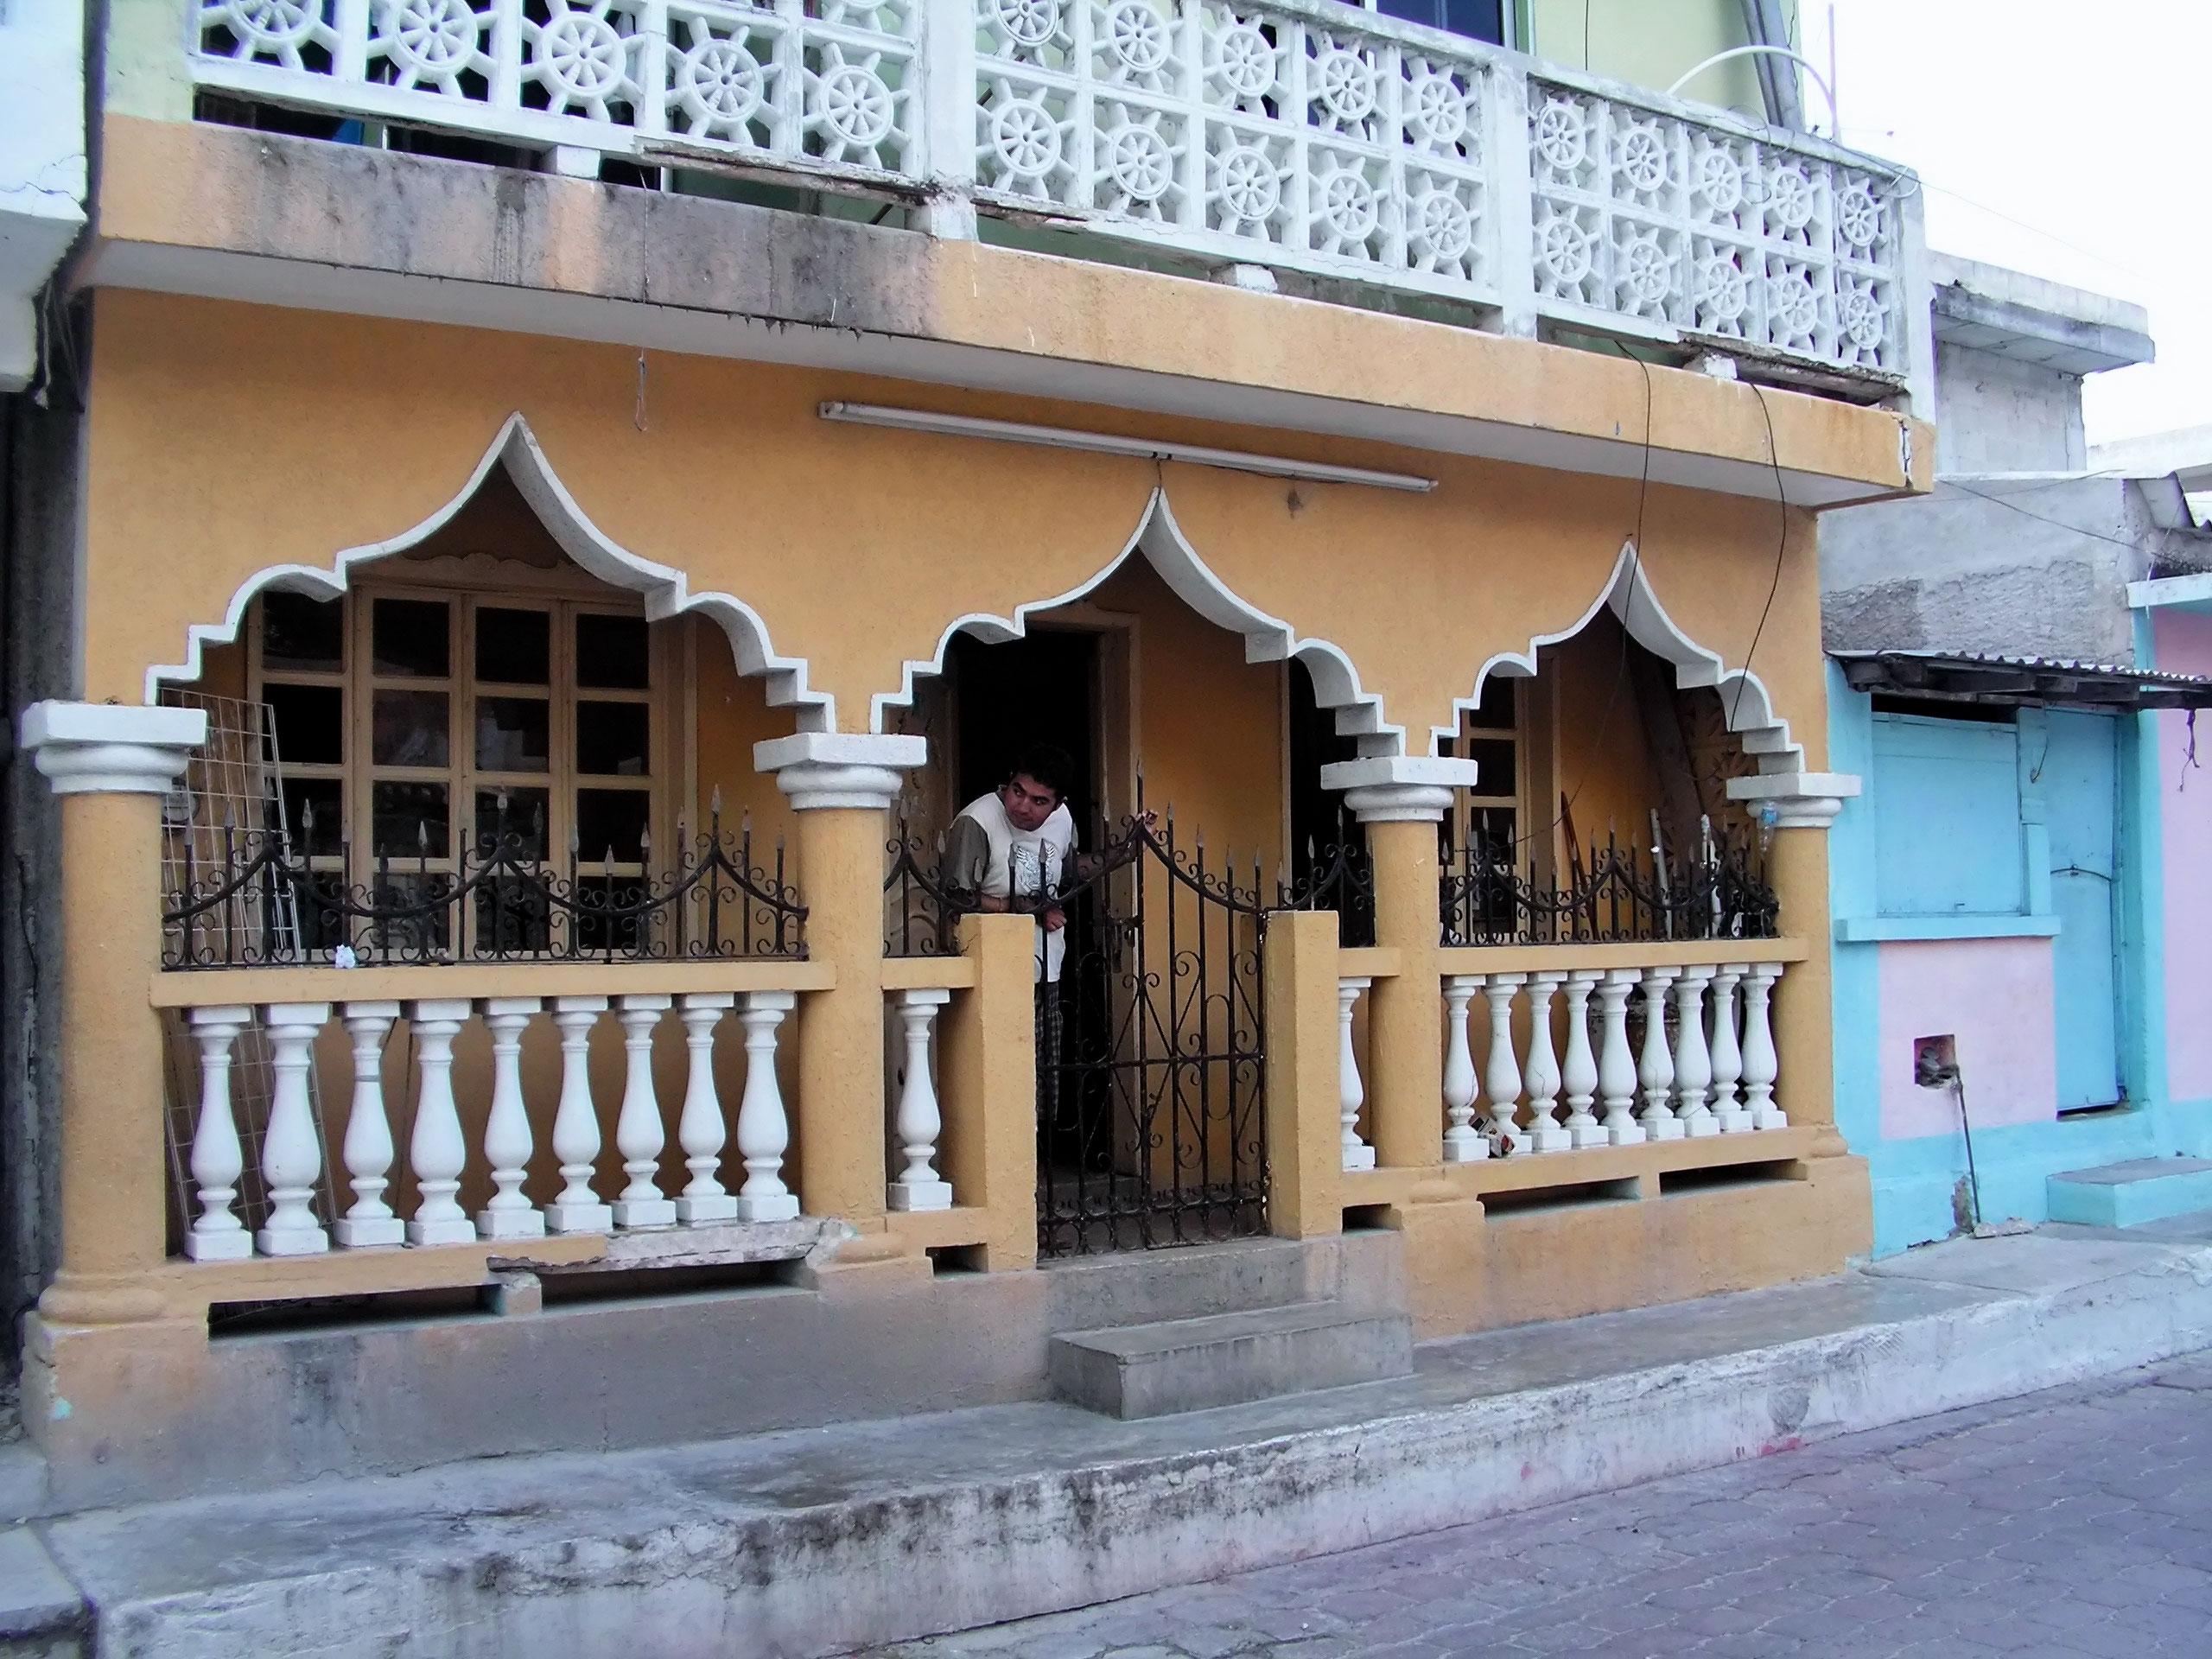 Isla Mujeres - capnvideo | ello